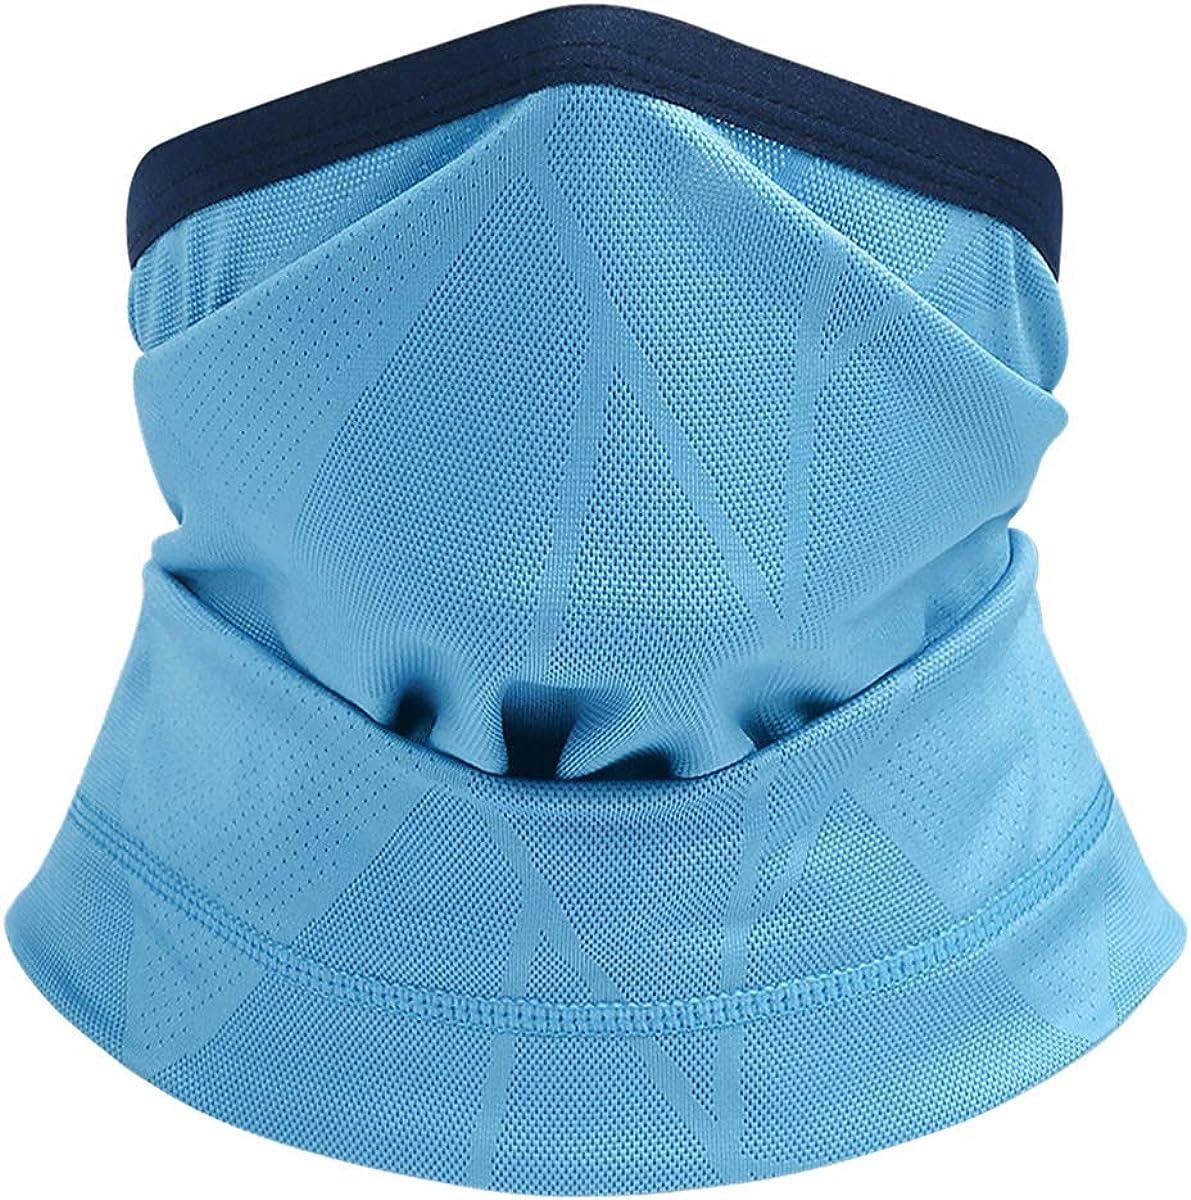 Bandana Scarf UV Protection for Cycling Hiking Fishing Mask for Men Women TClian Face Mask Neck Gaiters UPF 50